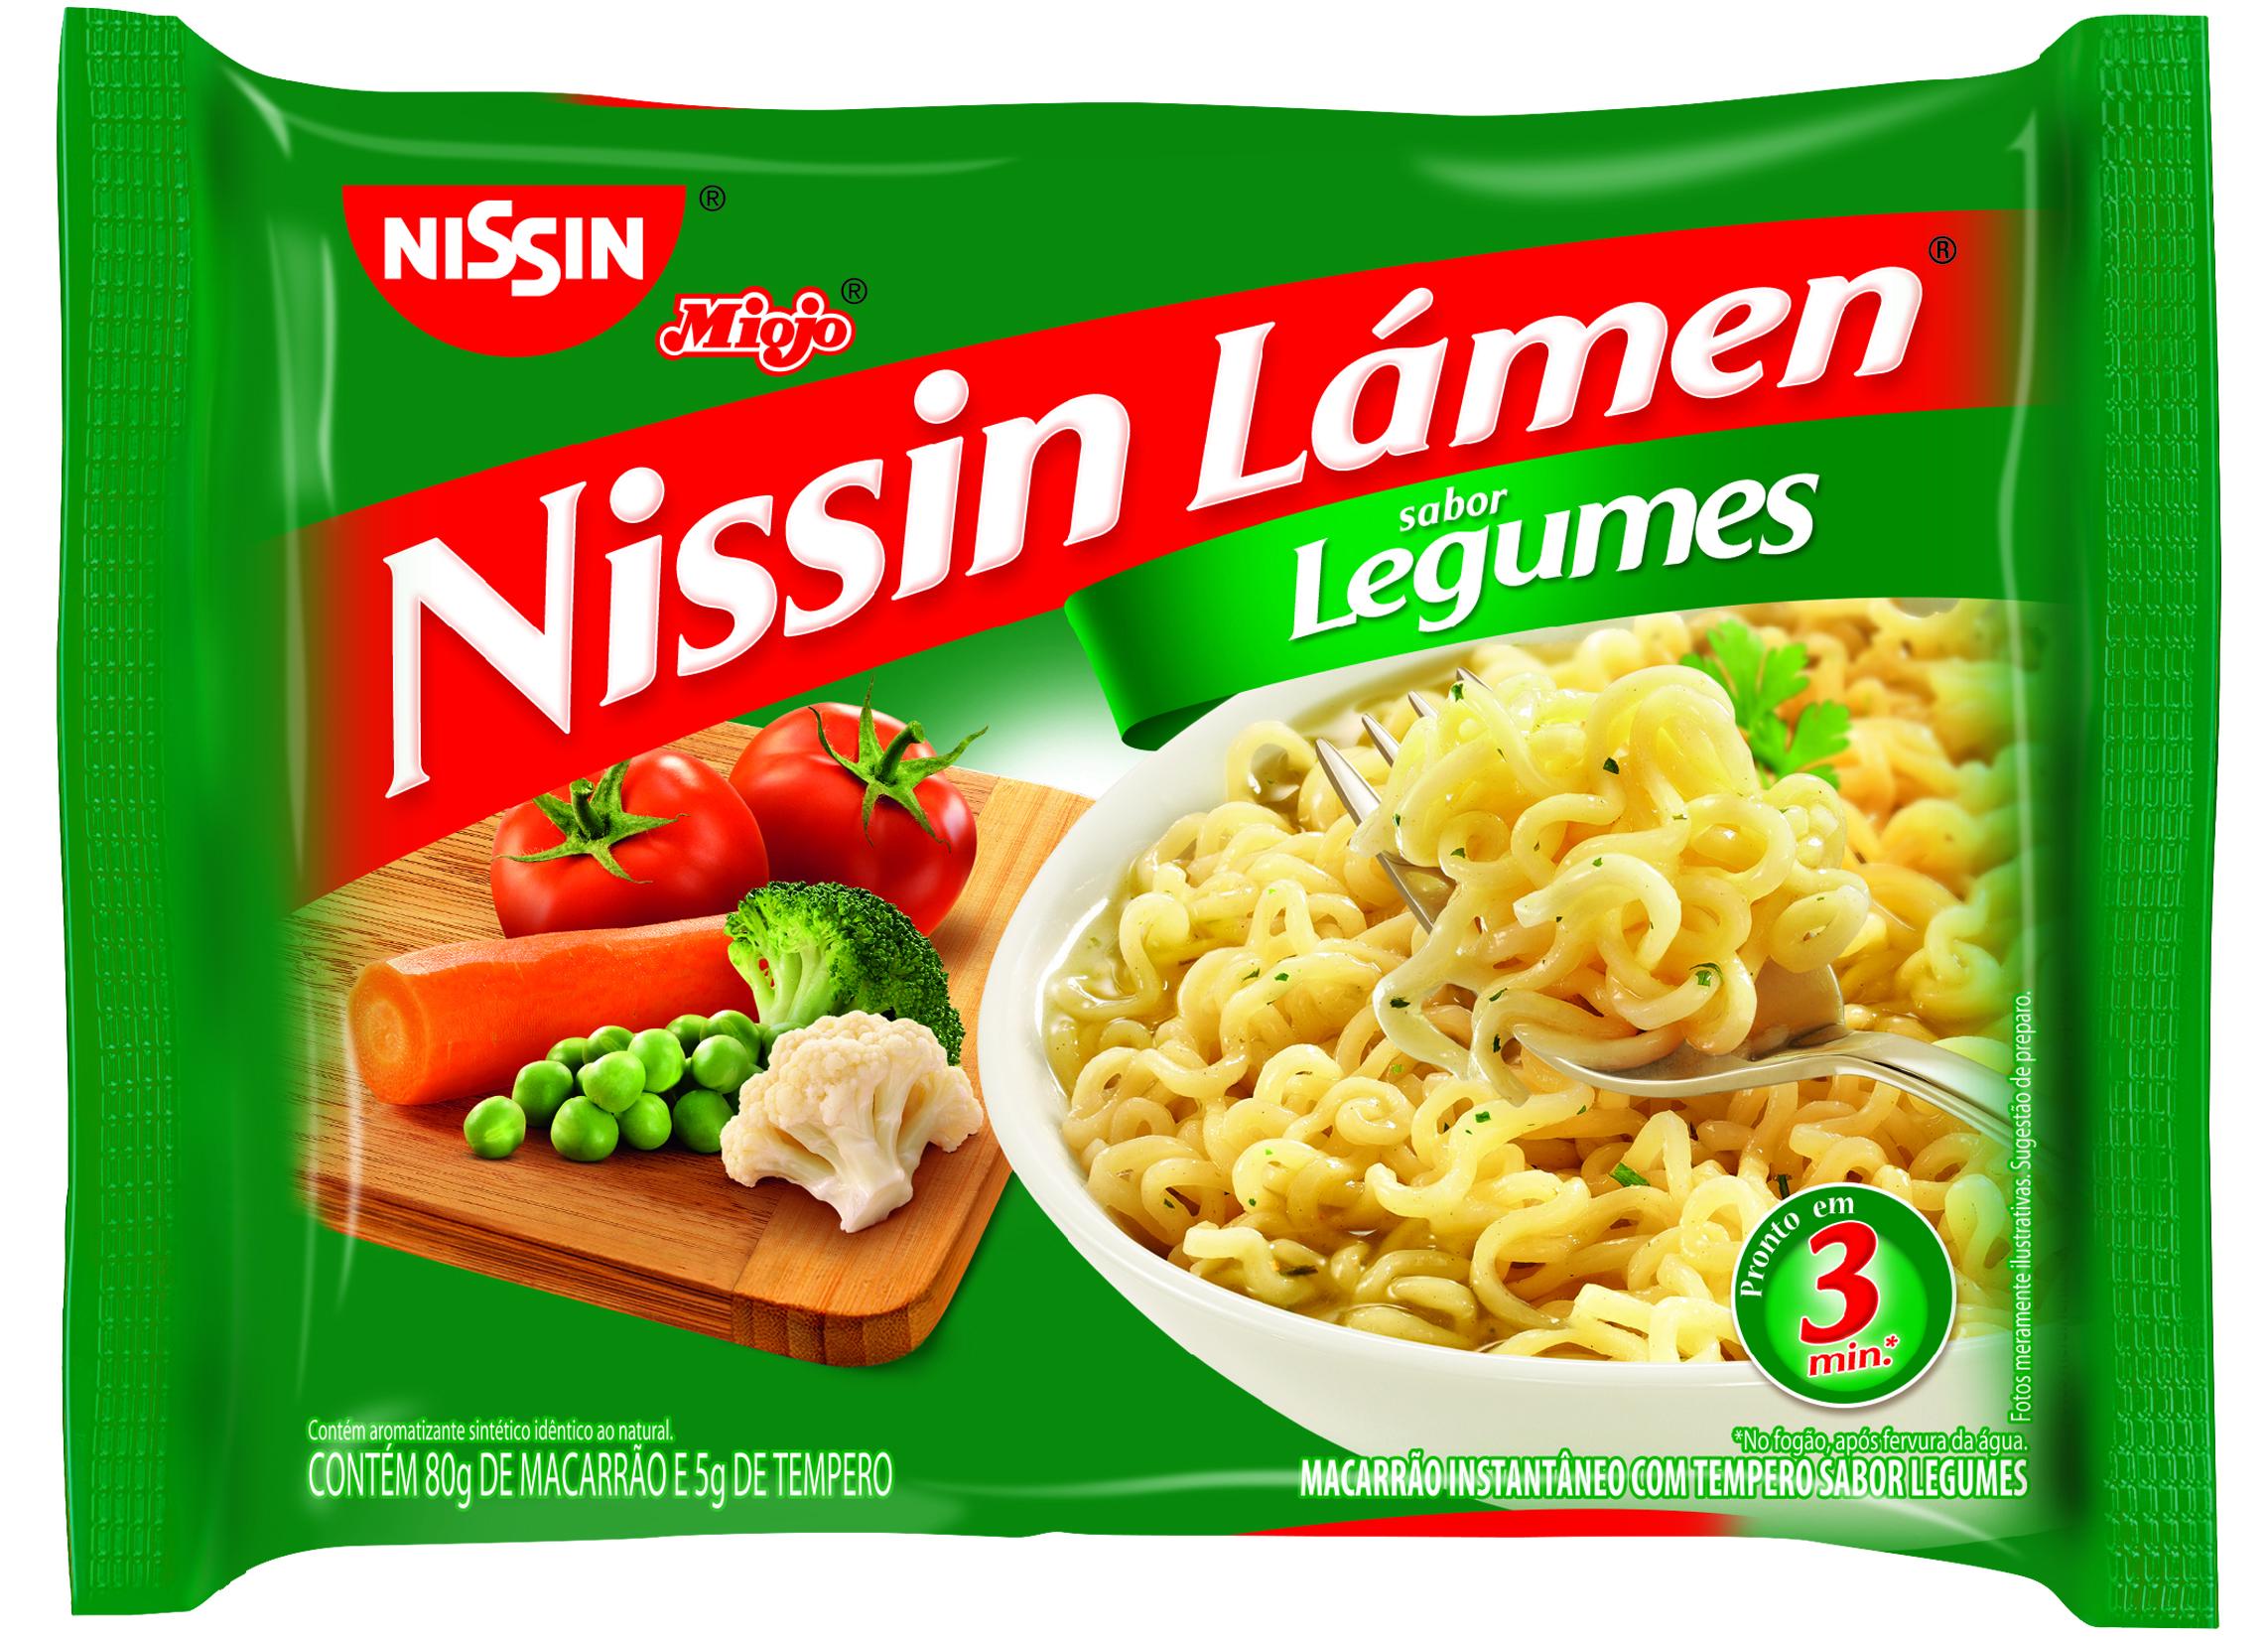 NISSIN LAMEN LEGUMES 1X85G (50)